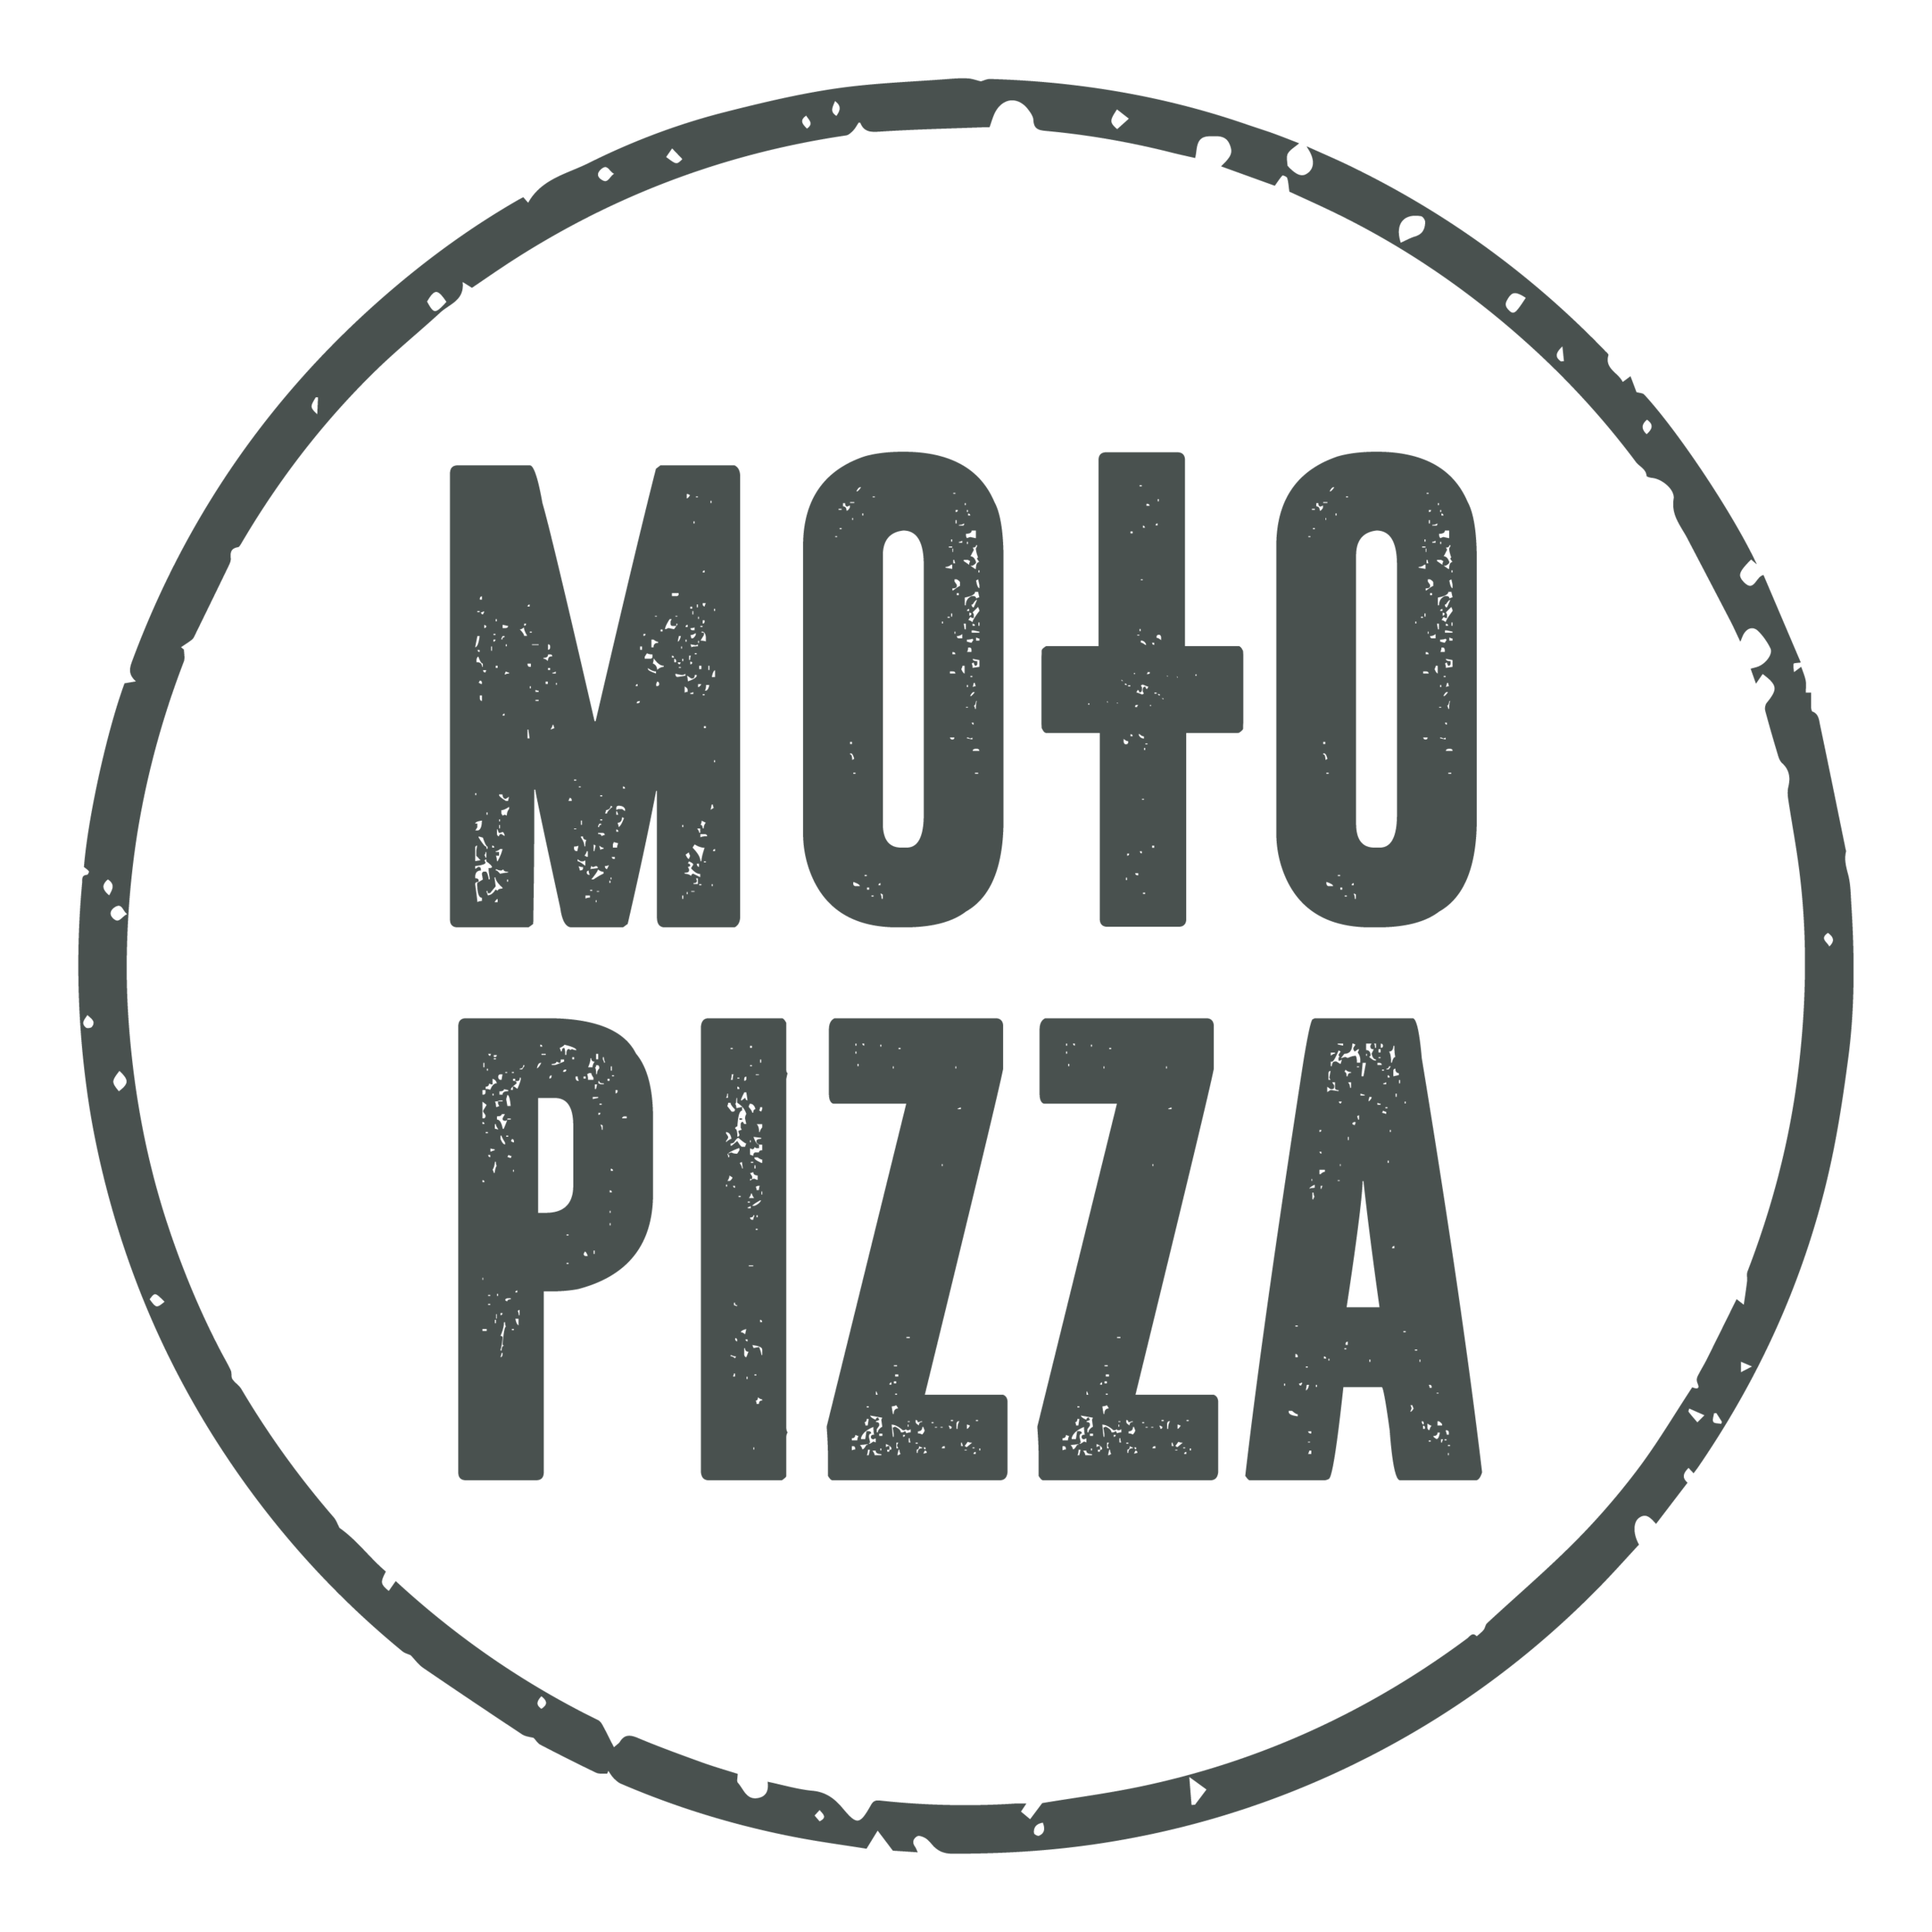 Moto Pizza Logo-01.png